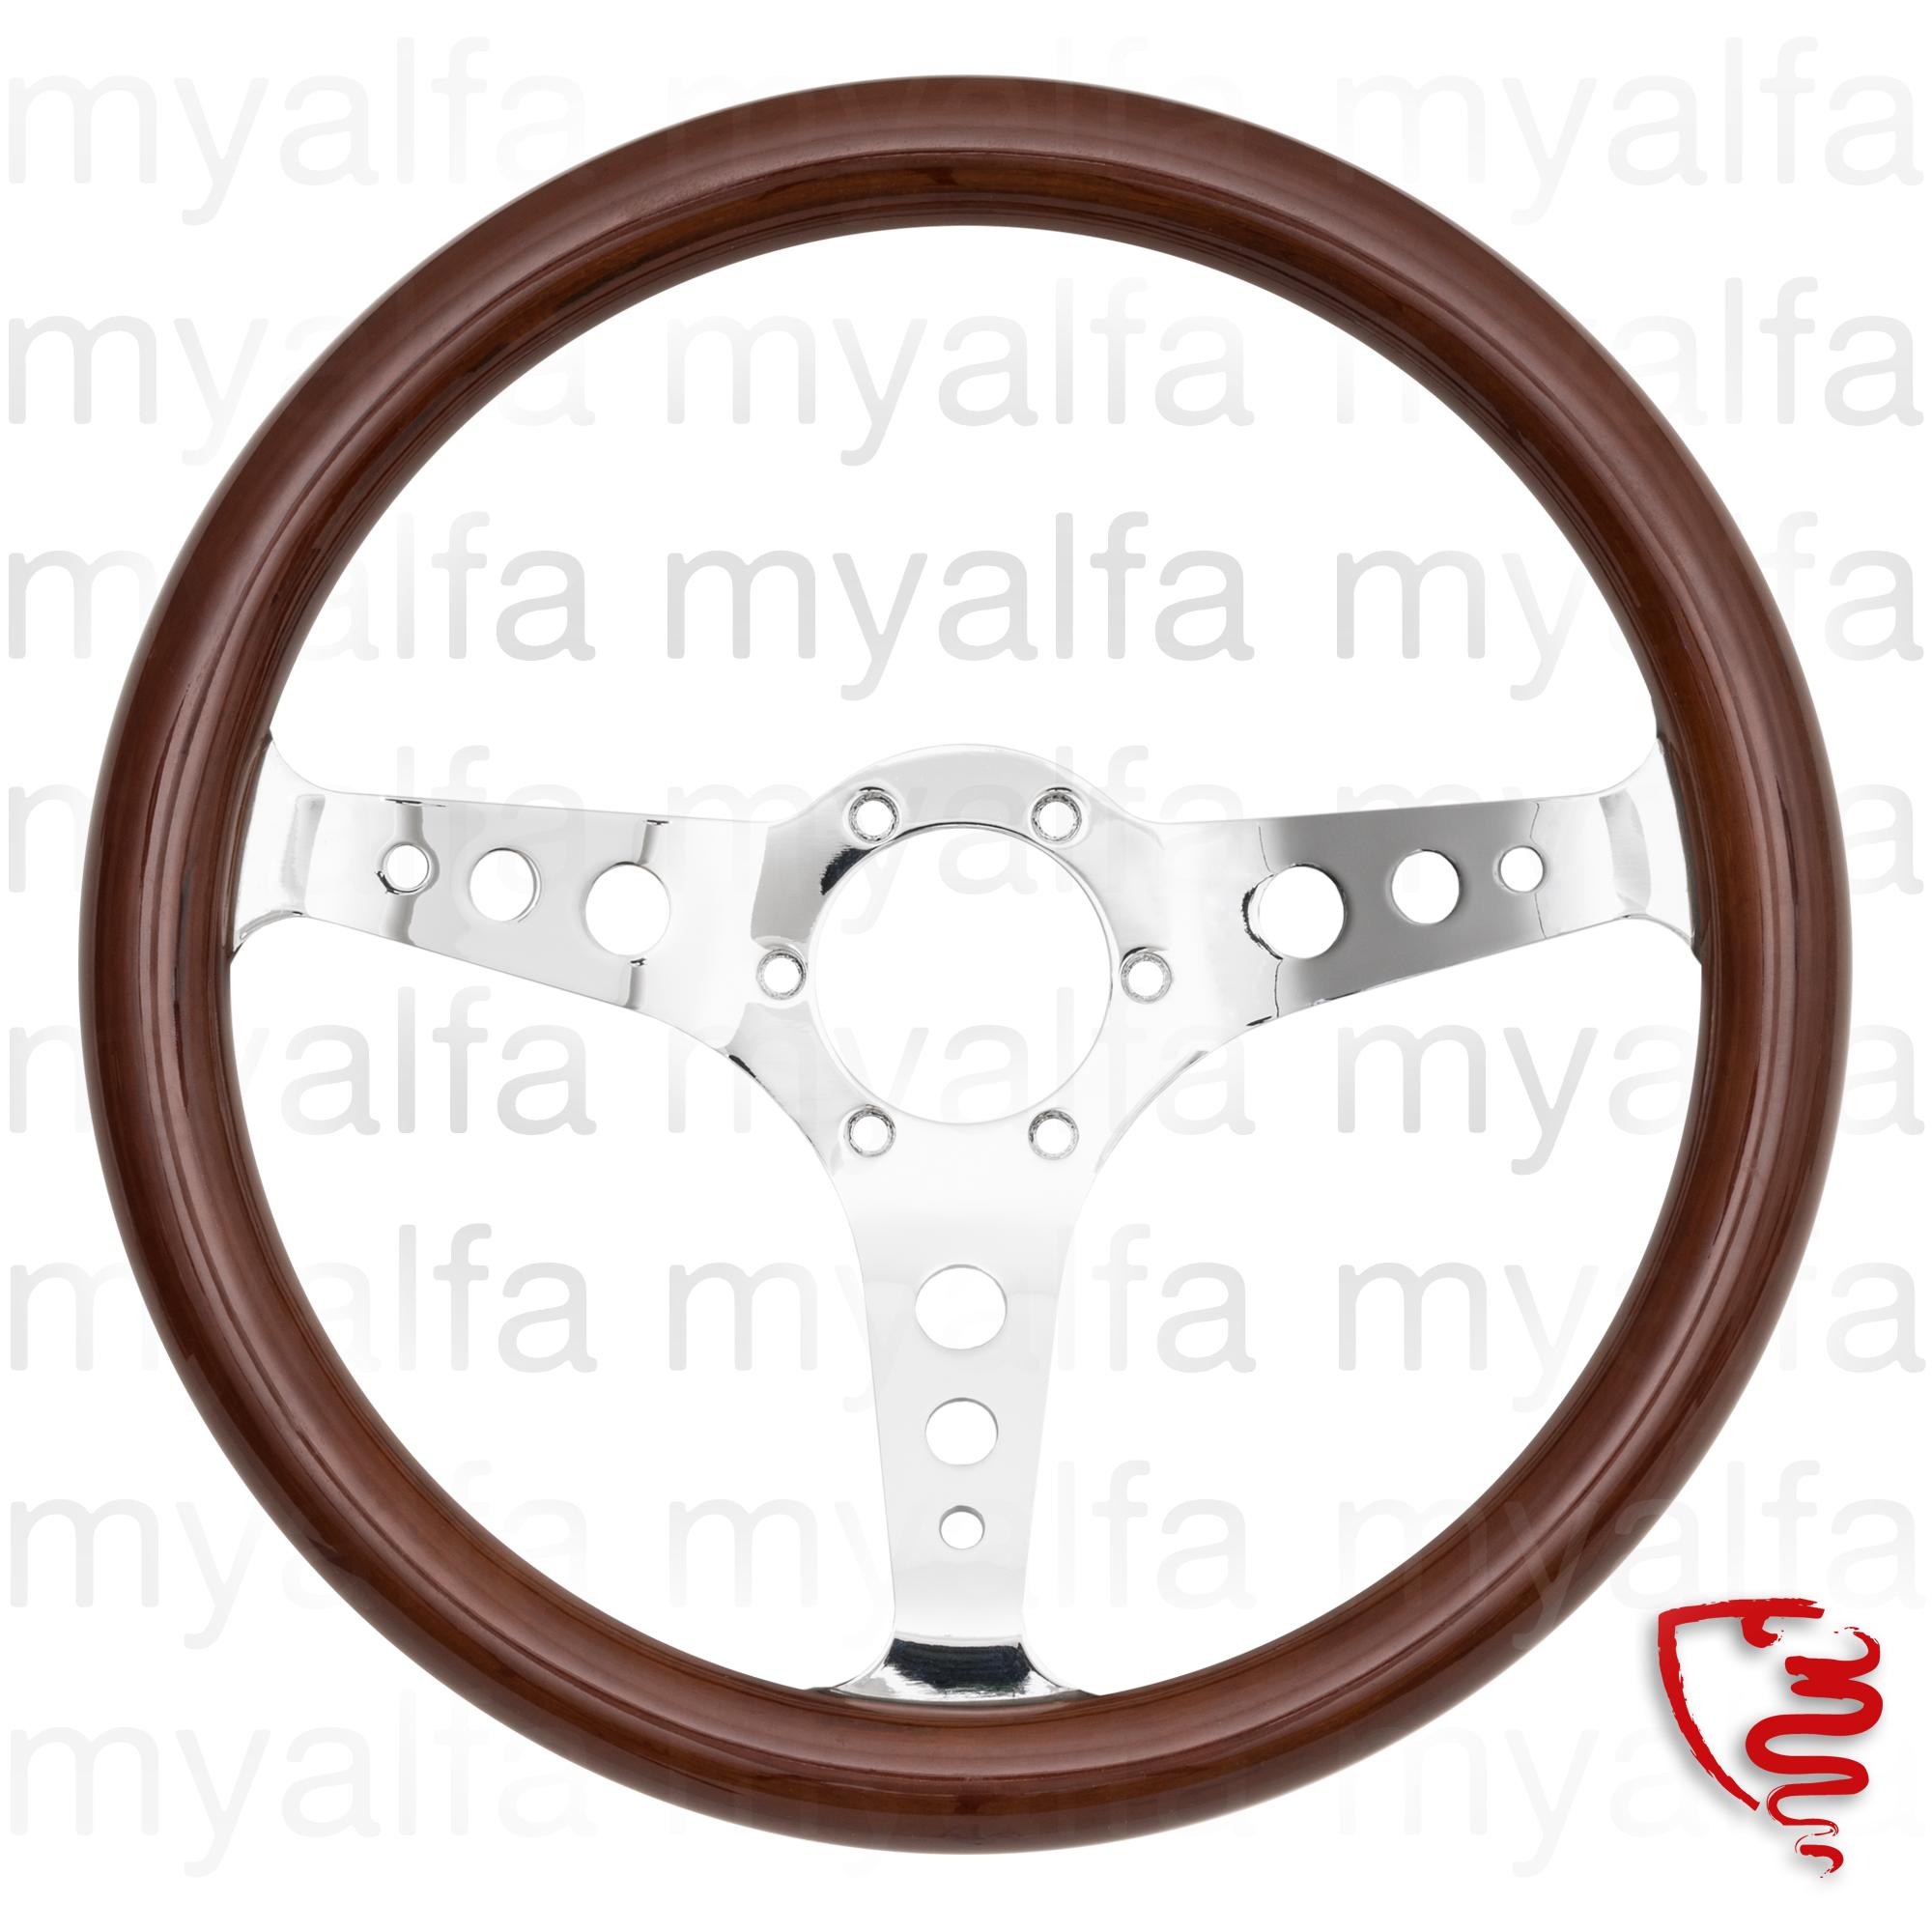 Mahogany steering wheel 350mm chrome radius c / drilling for 105/115, Interior, Steering wheels, Wood